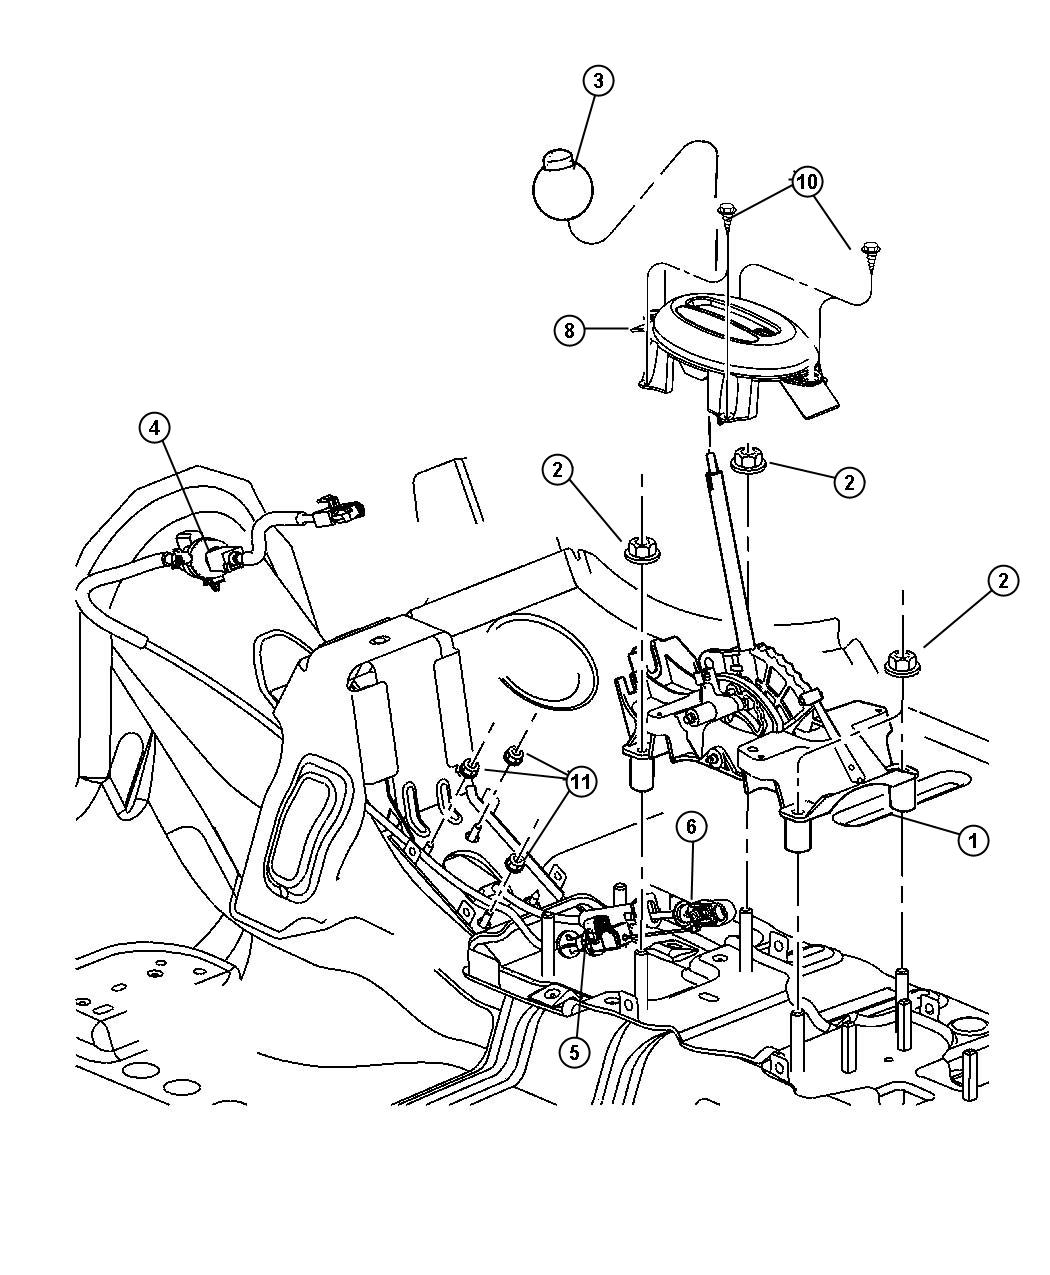 2002 Chrysler Pt Cruiser Cable  Ignition Interlock